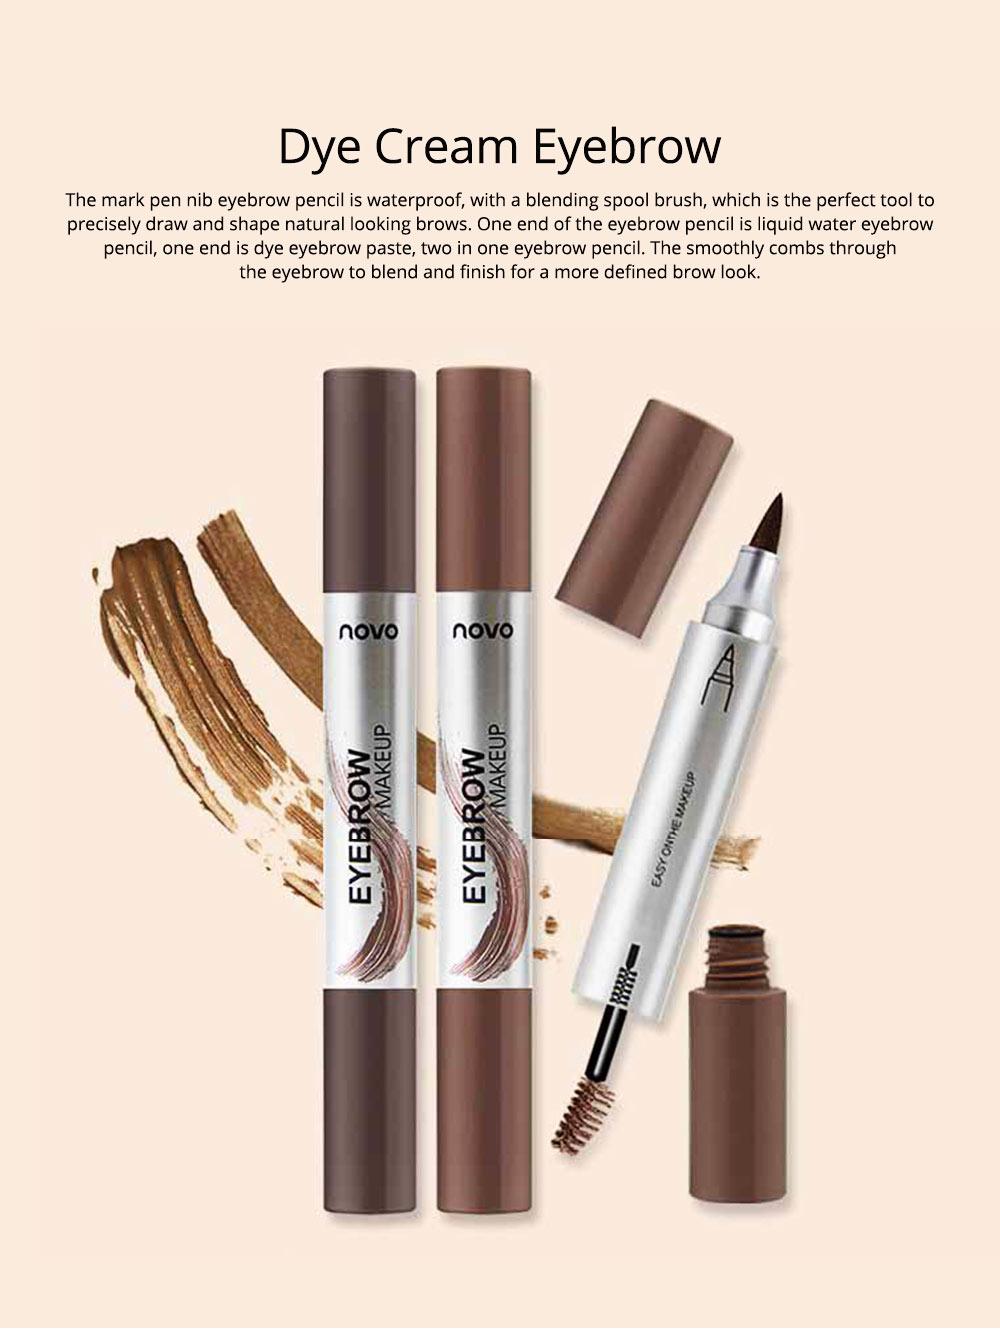 Dye Cream Eyebrow, Mark Pen Nib Eyebrow Pencil, Waterproof Eyebrow Pencil with Brush 2 Colors Available 0